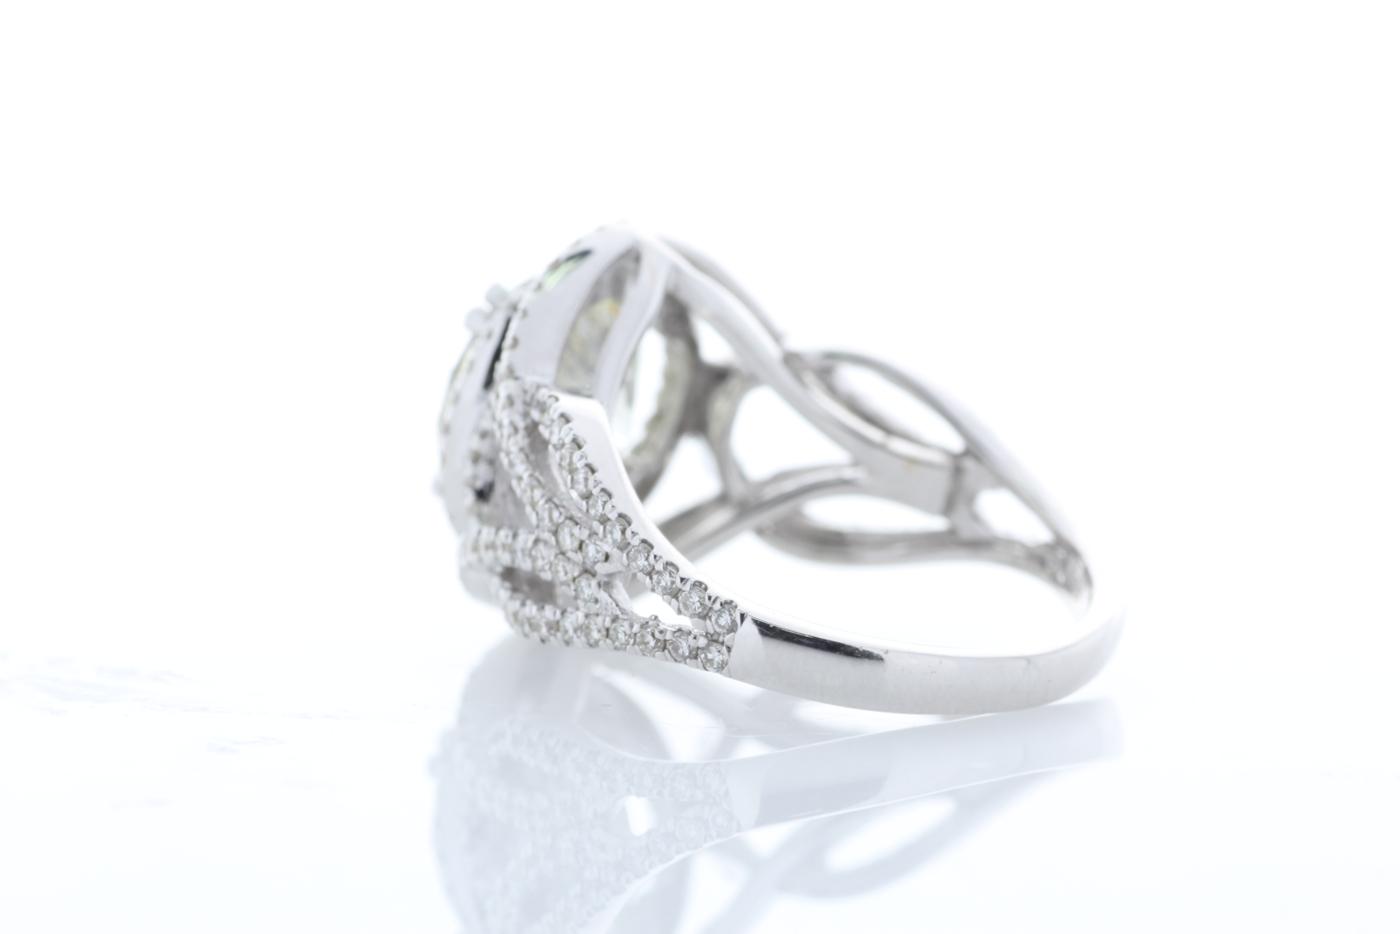 18k White Gold Single Stone With Halo Setting Ring 5.17 - Image 3 of 5